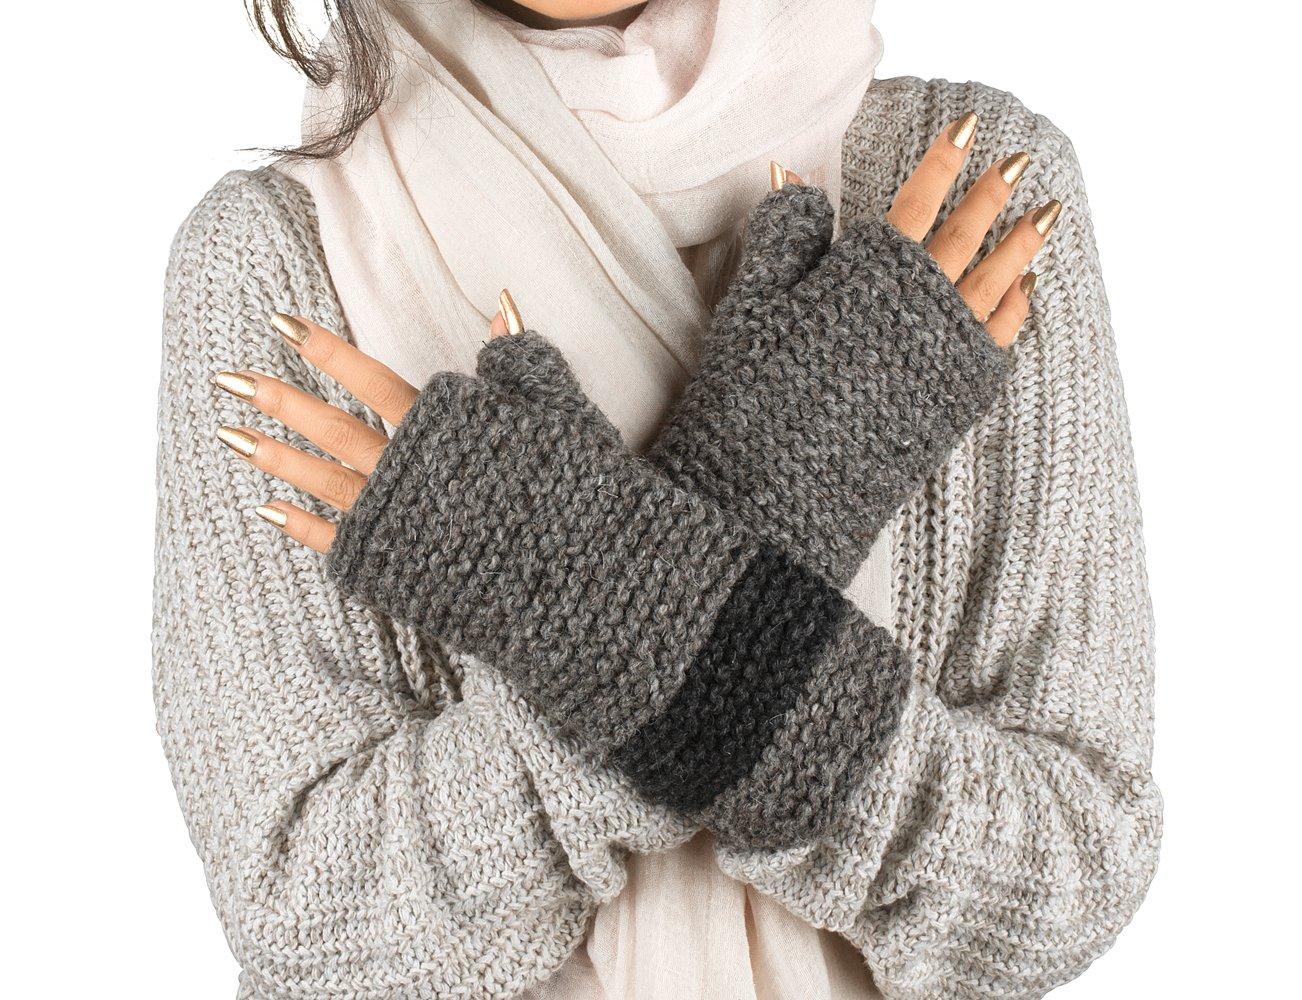 100% Wool Fingerless Gloves Arm Warmer Winter Warm Fleece inside Gloves Hand Knit Crochet Woman Cable Thumb Hole